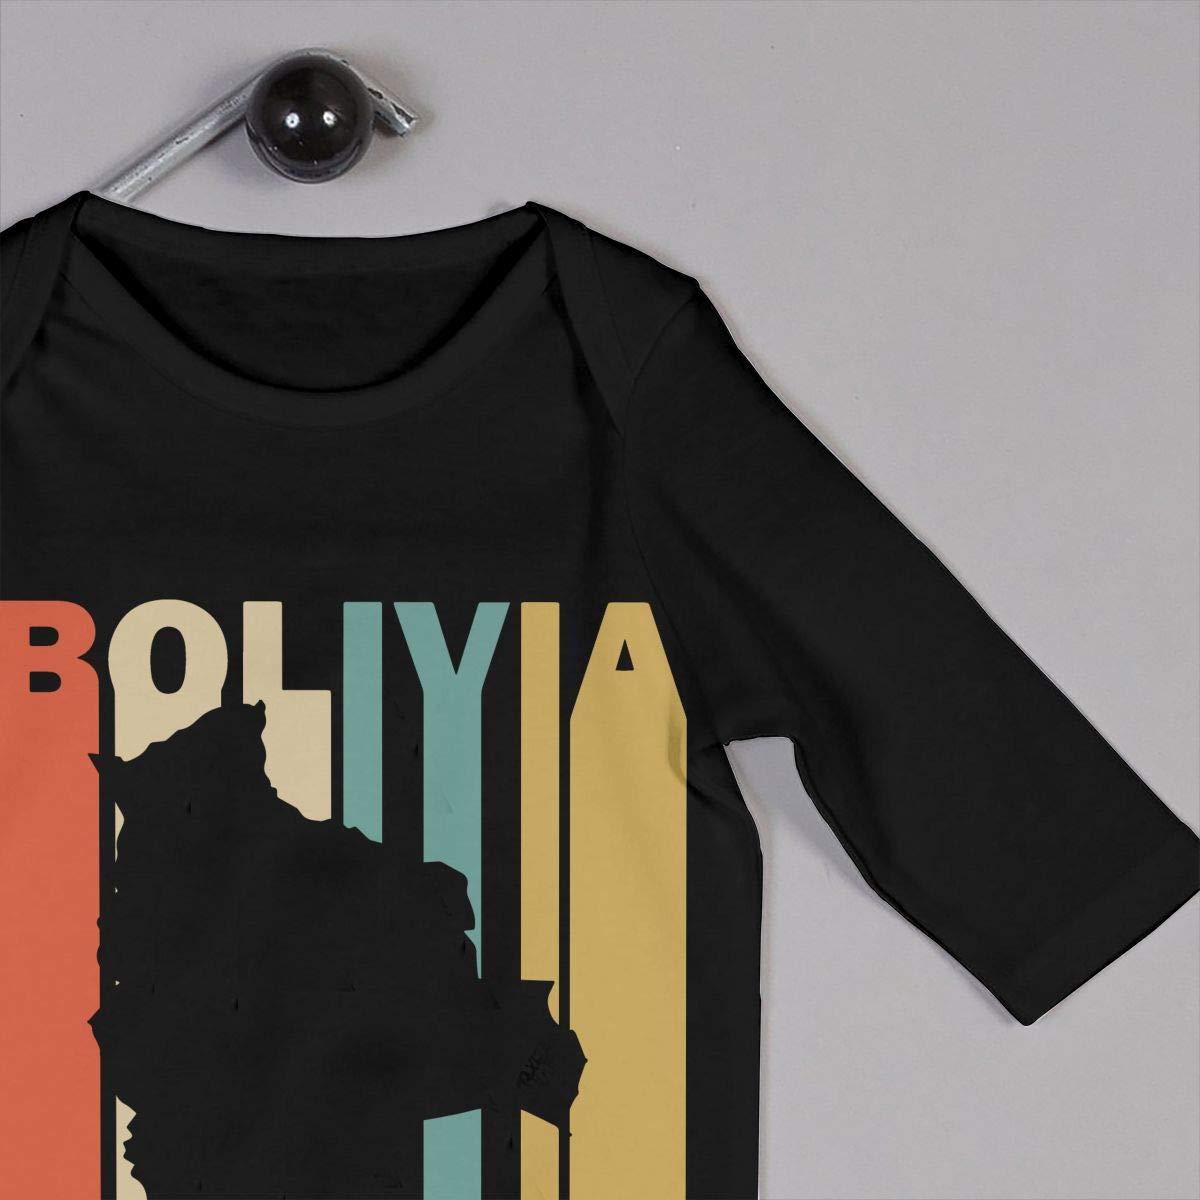 Long Sleeve Cotton Bodysuit for Baby Girls Boys Fashion Retro Style Bolivia Silhouette Crawler Black